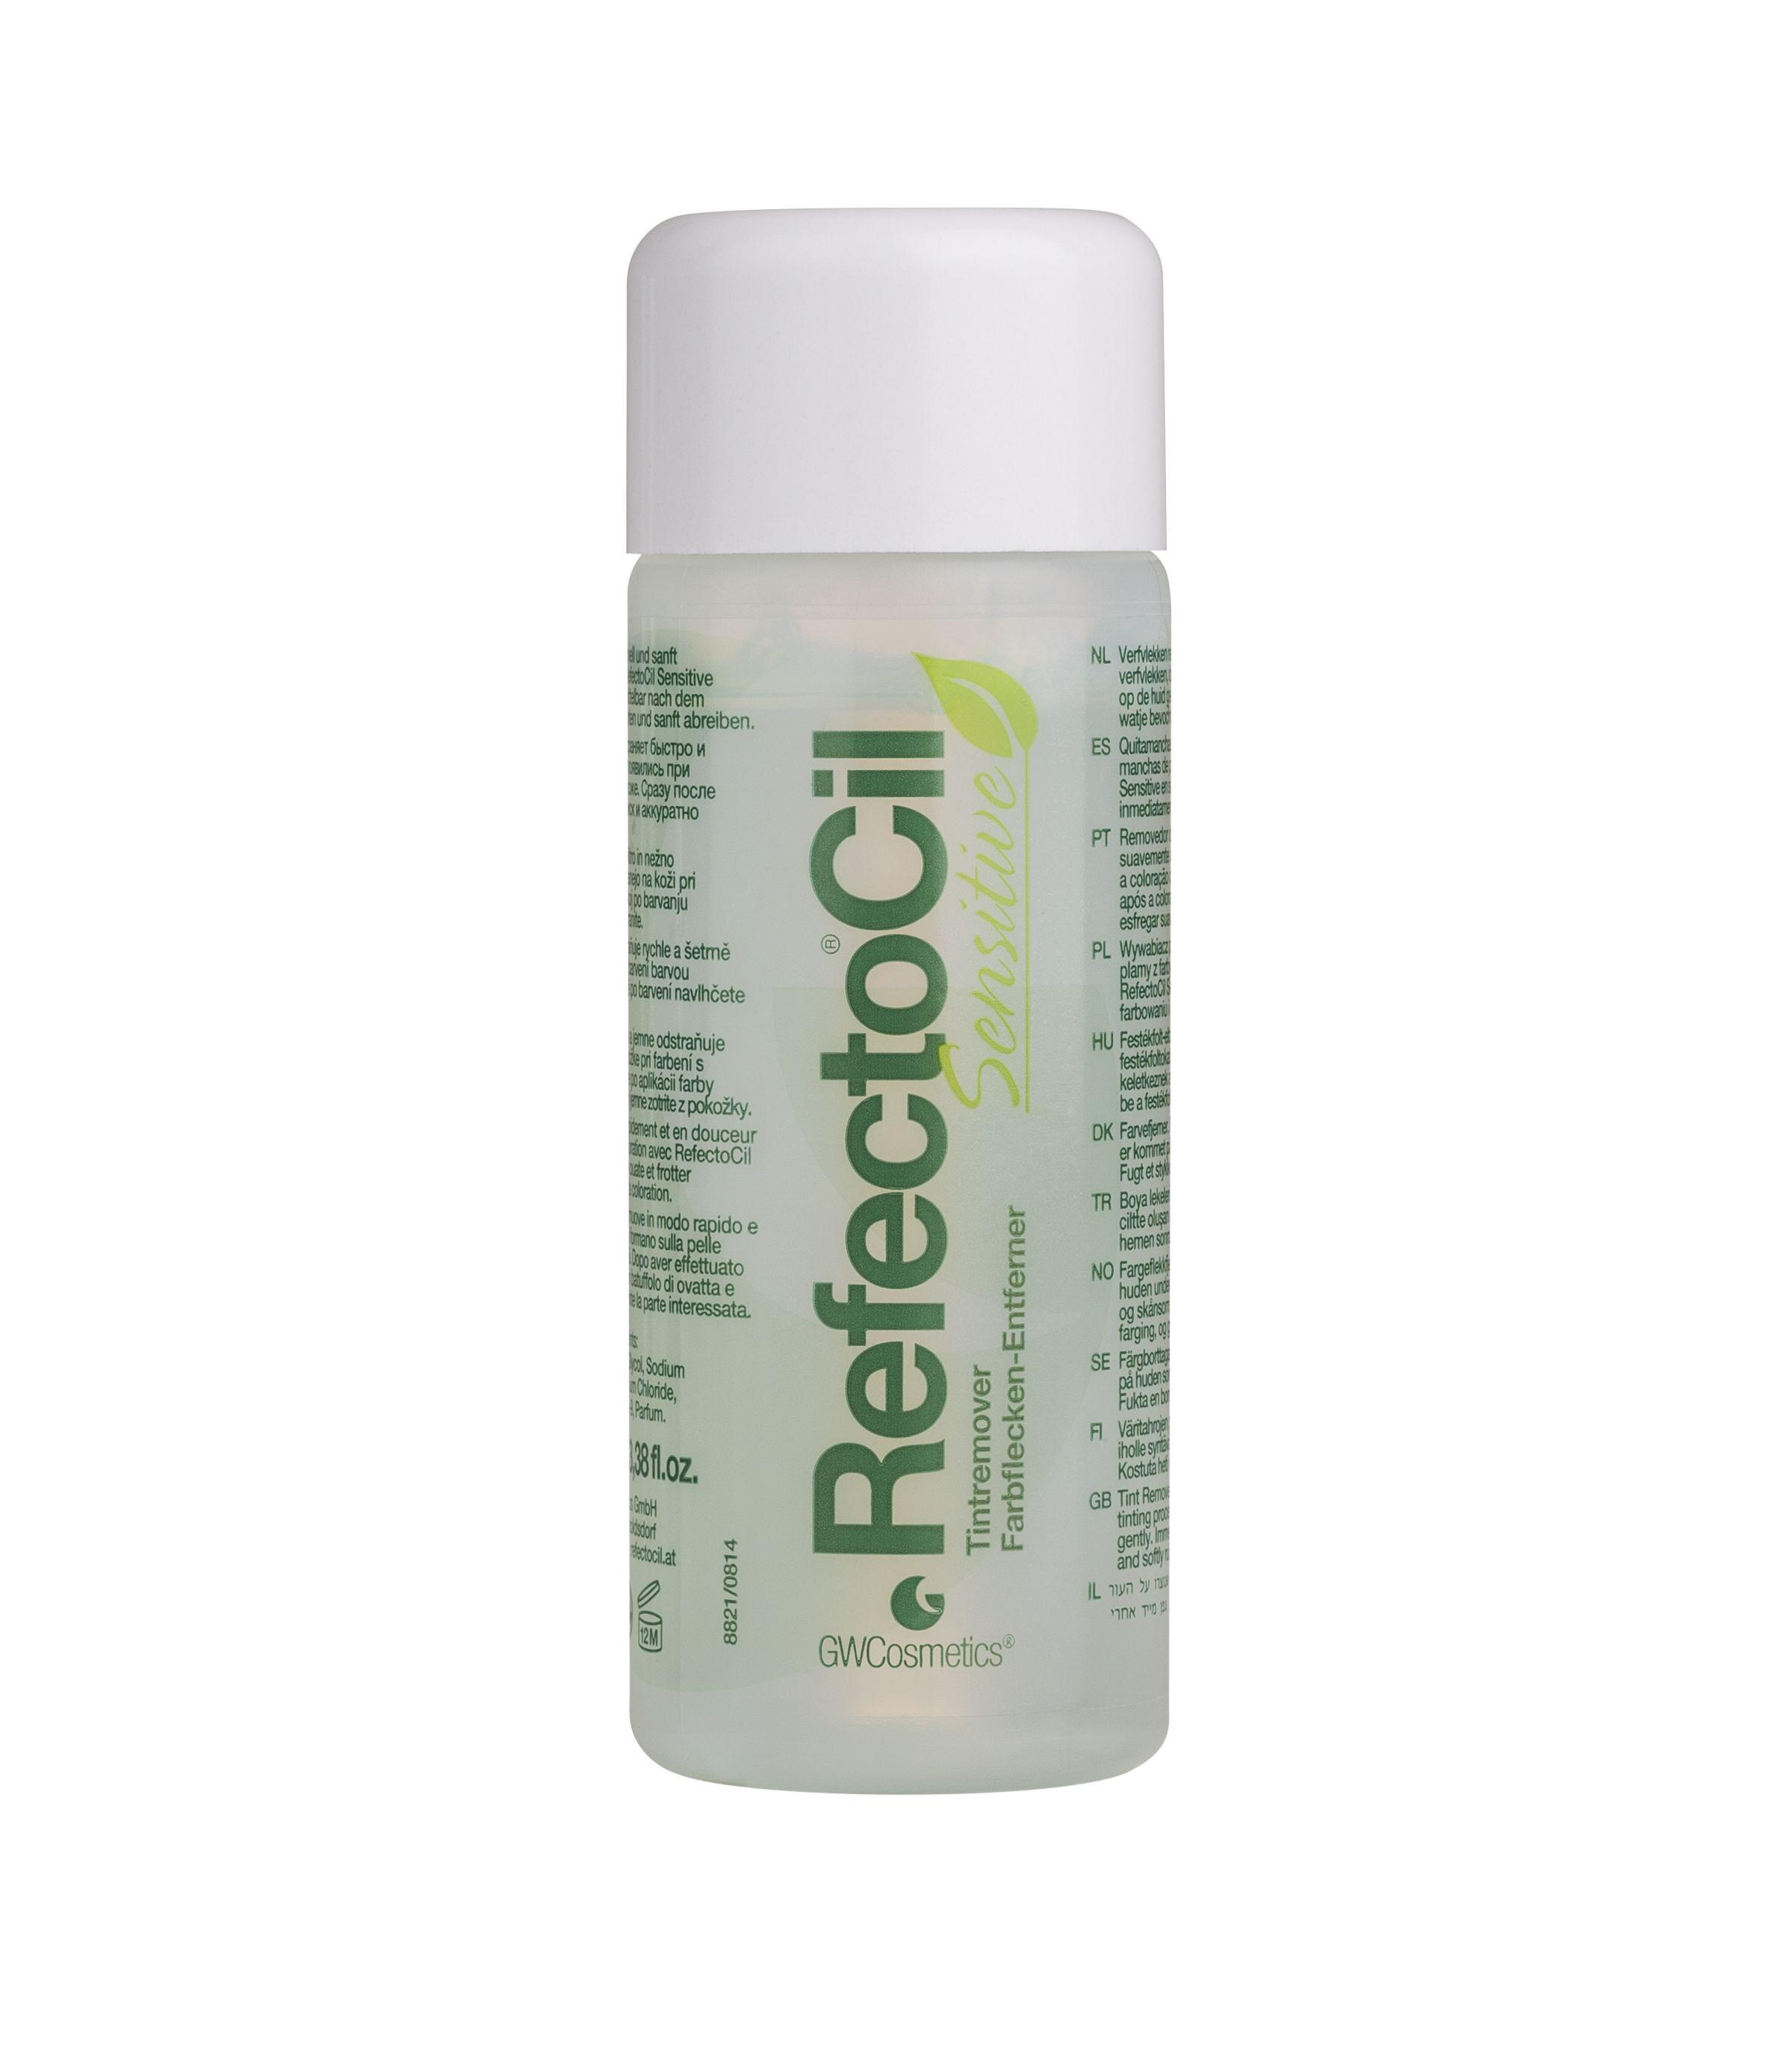 RefectoCil Sensitive Tint Remover 100ml. Colour remover